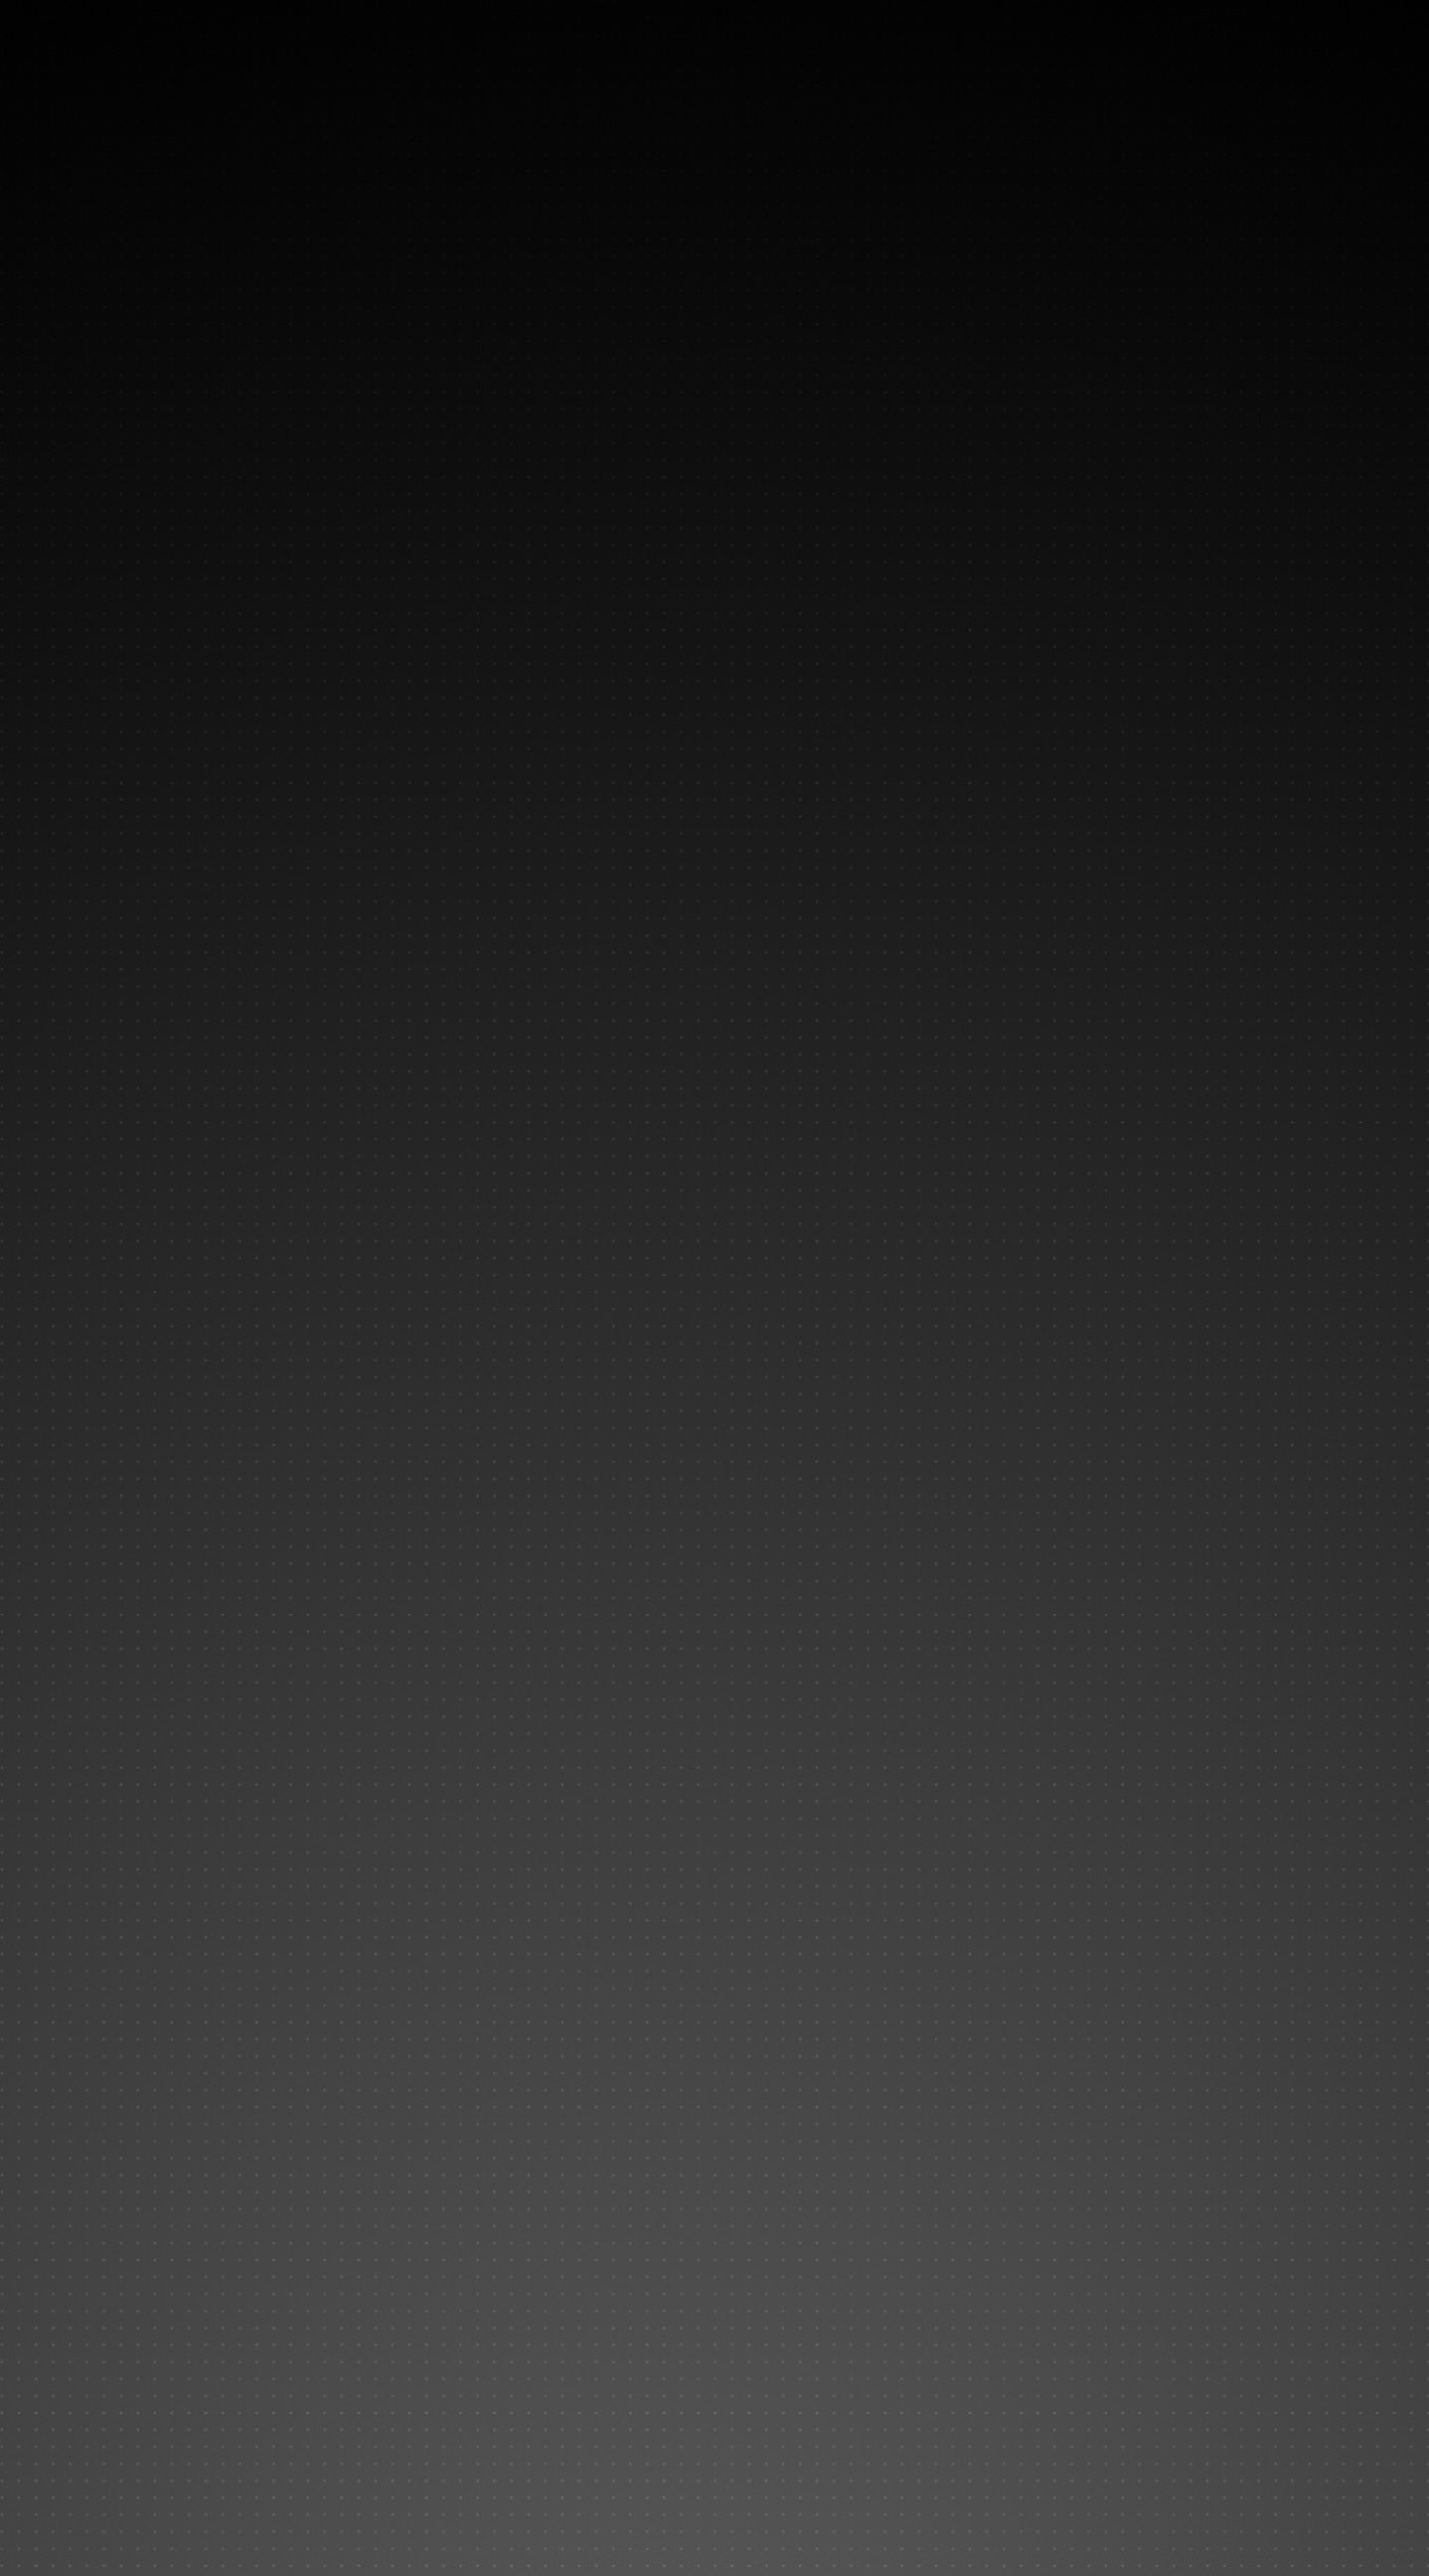 <b>iPhone 6 Carbon</b> Fiber <b>Wallpaper<